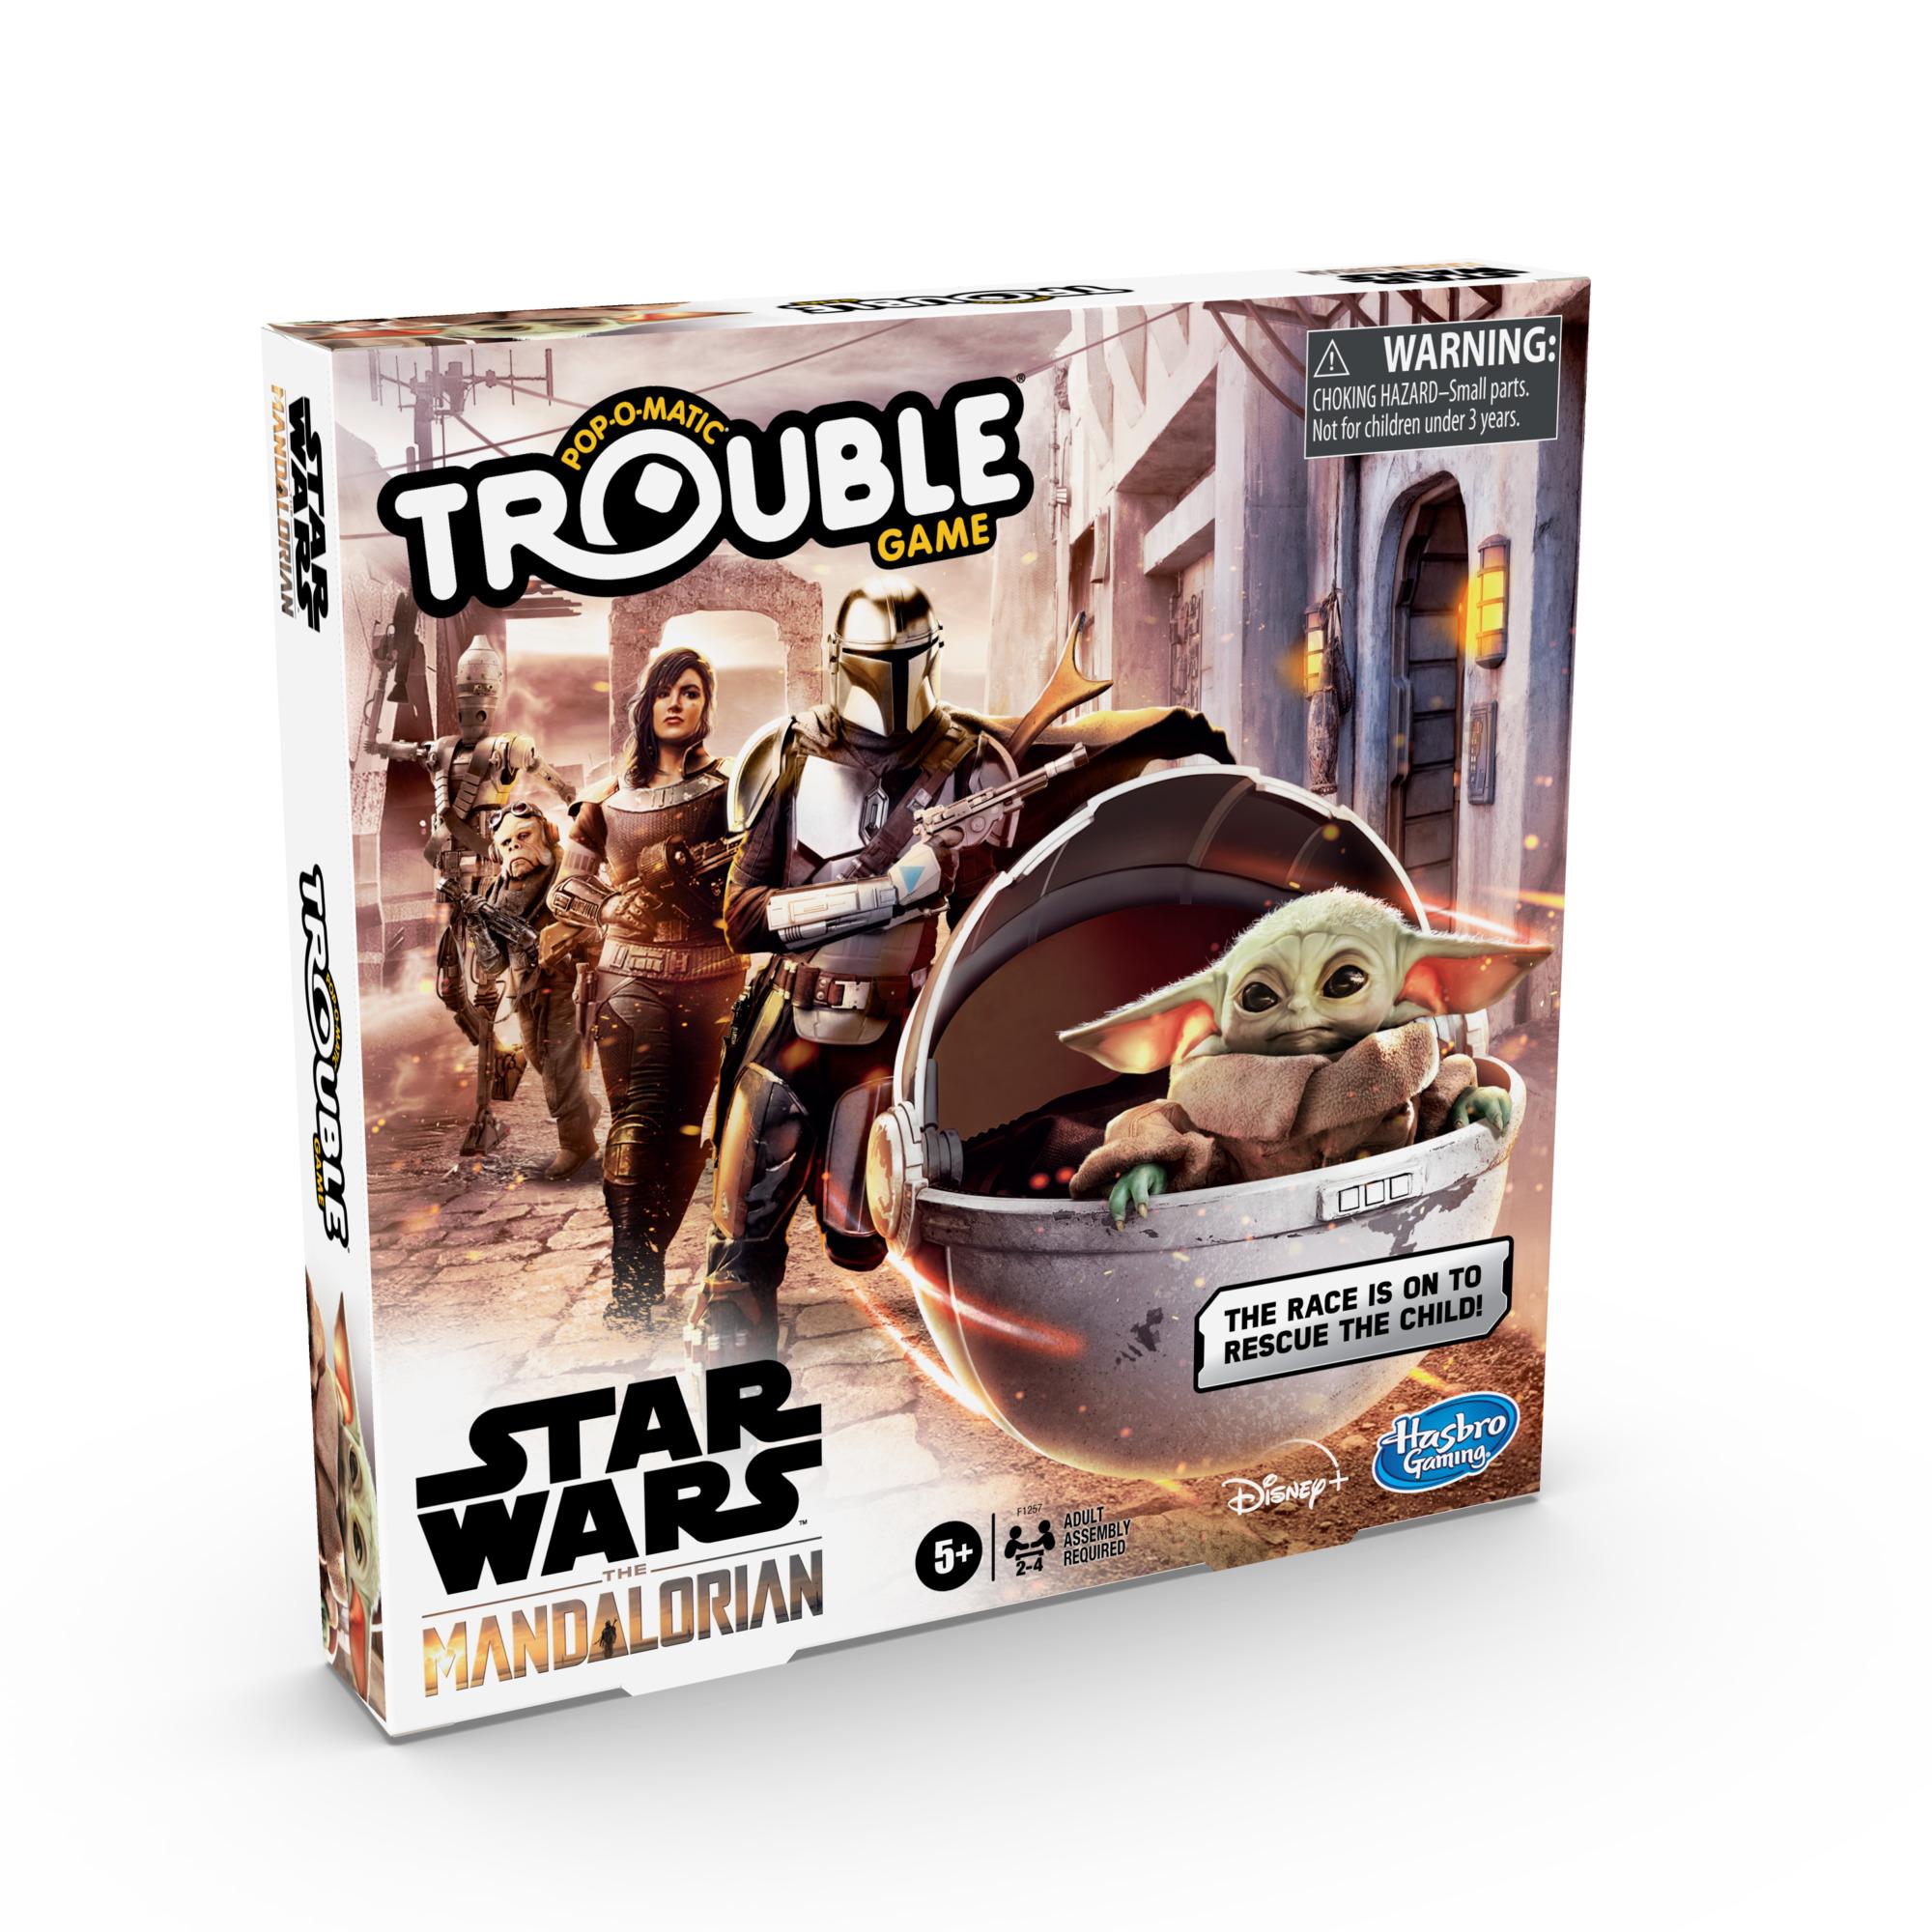 F12570000 Star Wars The Mandalorian Trouble Game 2 pkg